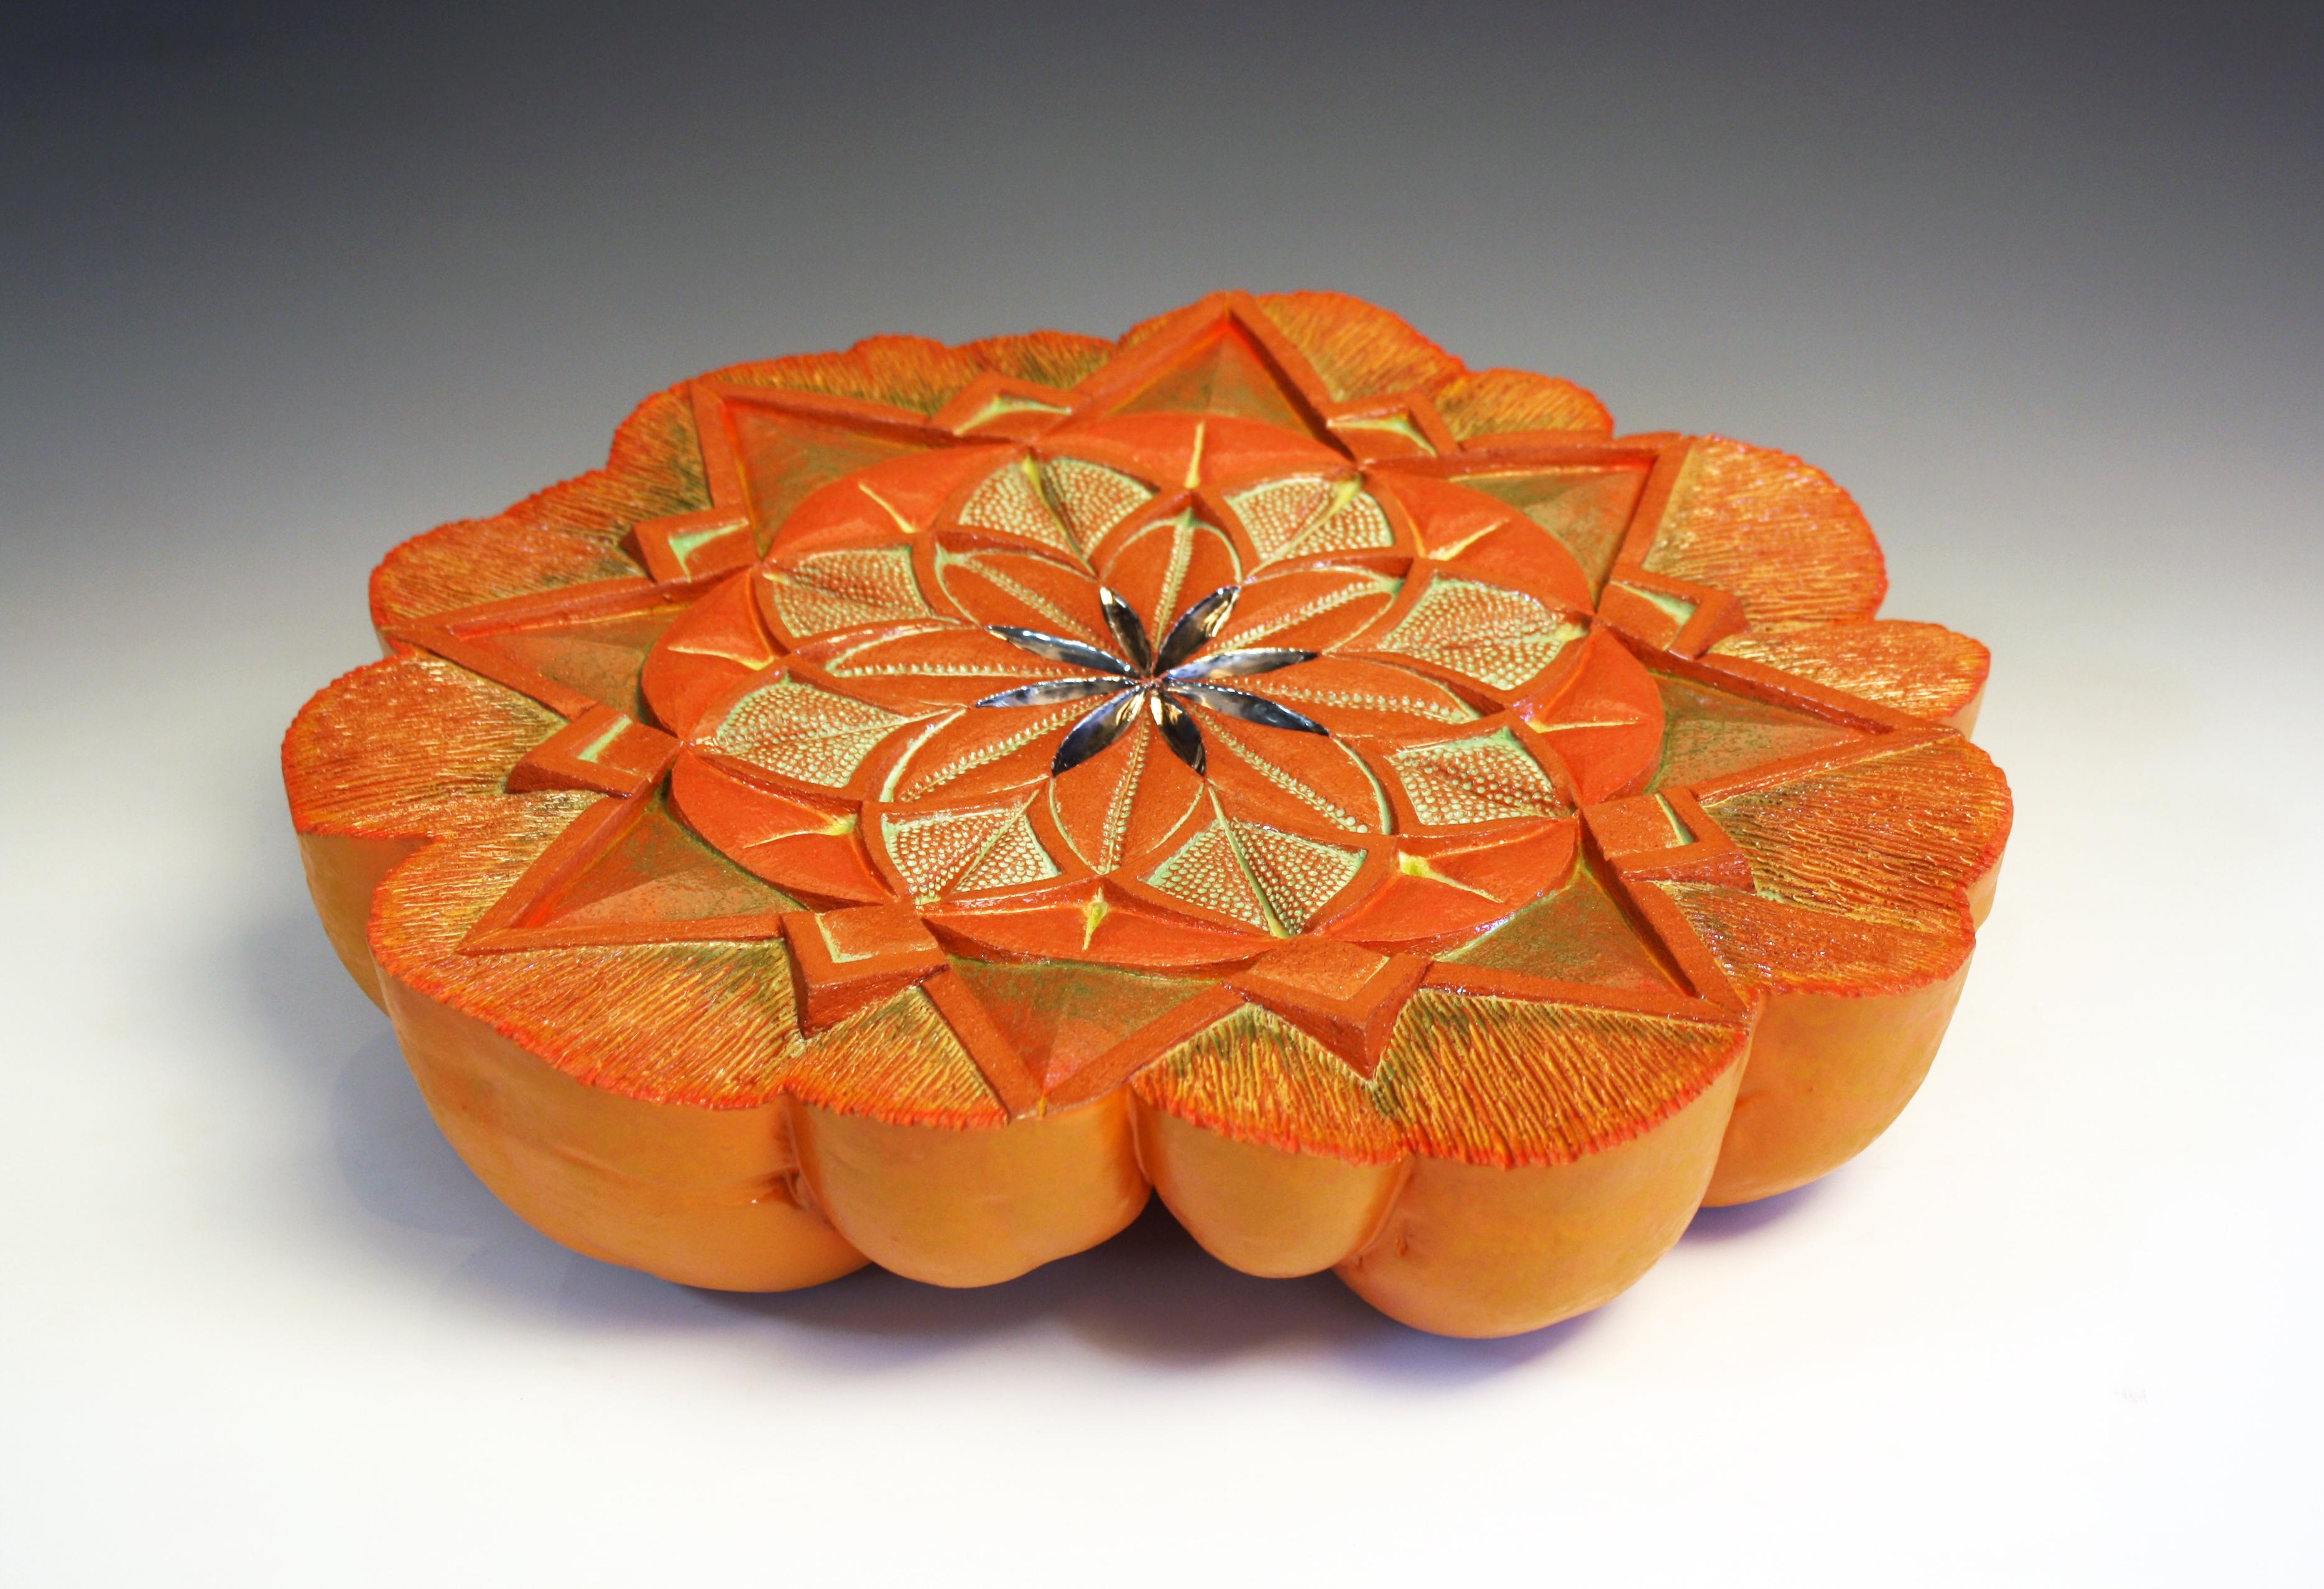 Cucurbita Maxima (Pumpkin)